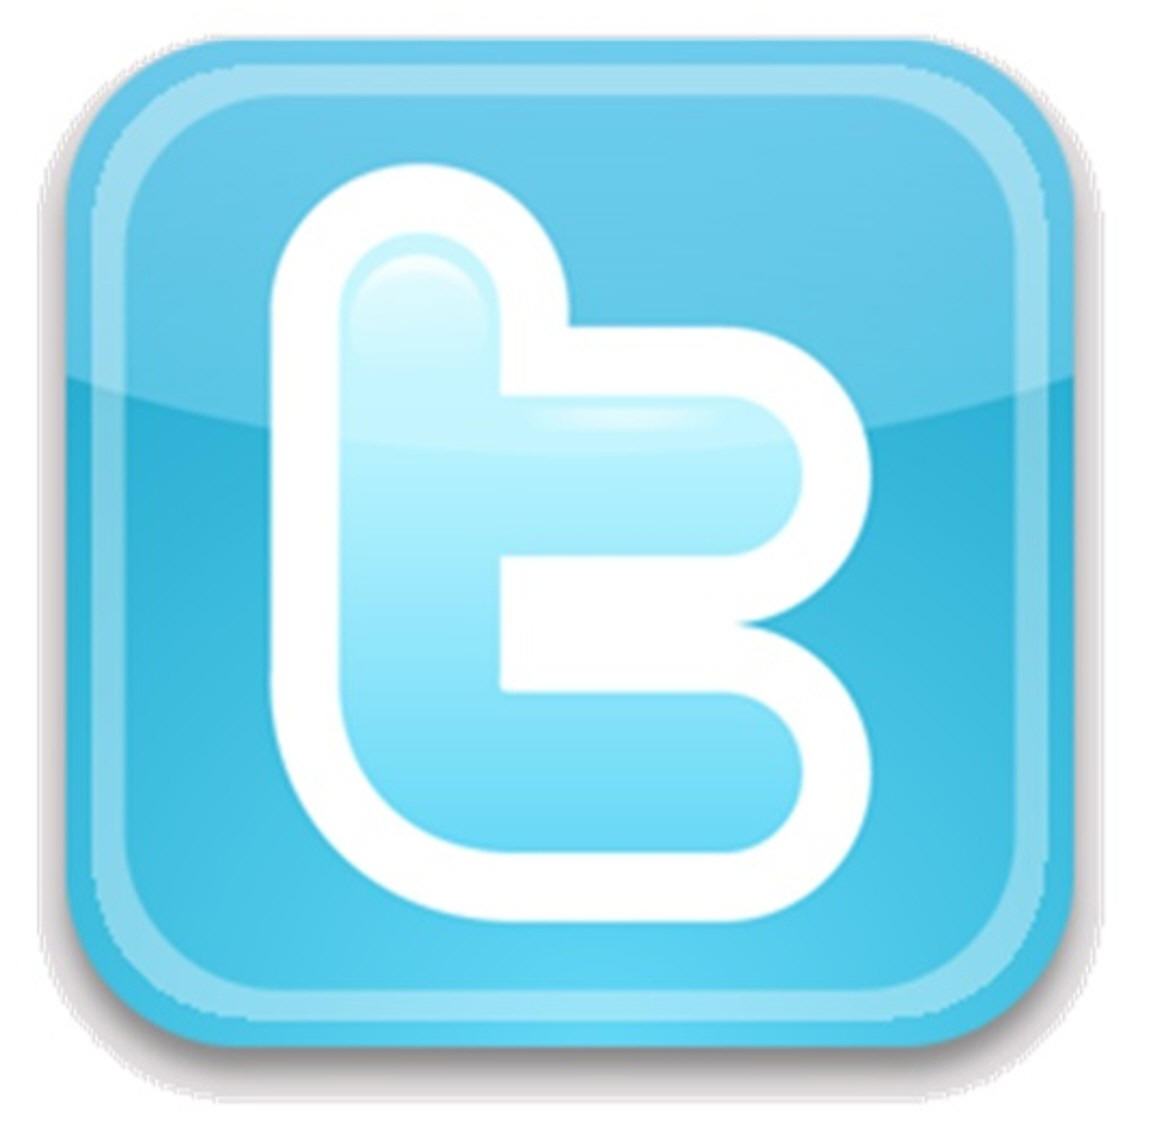 image logo square twitter jpg phineas and ferb fanon fandom rh pffanon wikia com twitter logo jpg download twitter logo jpg image